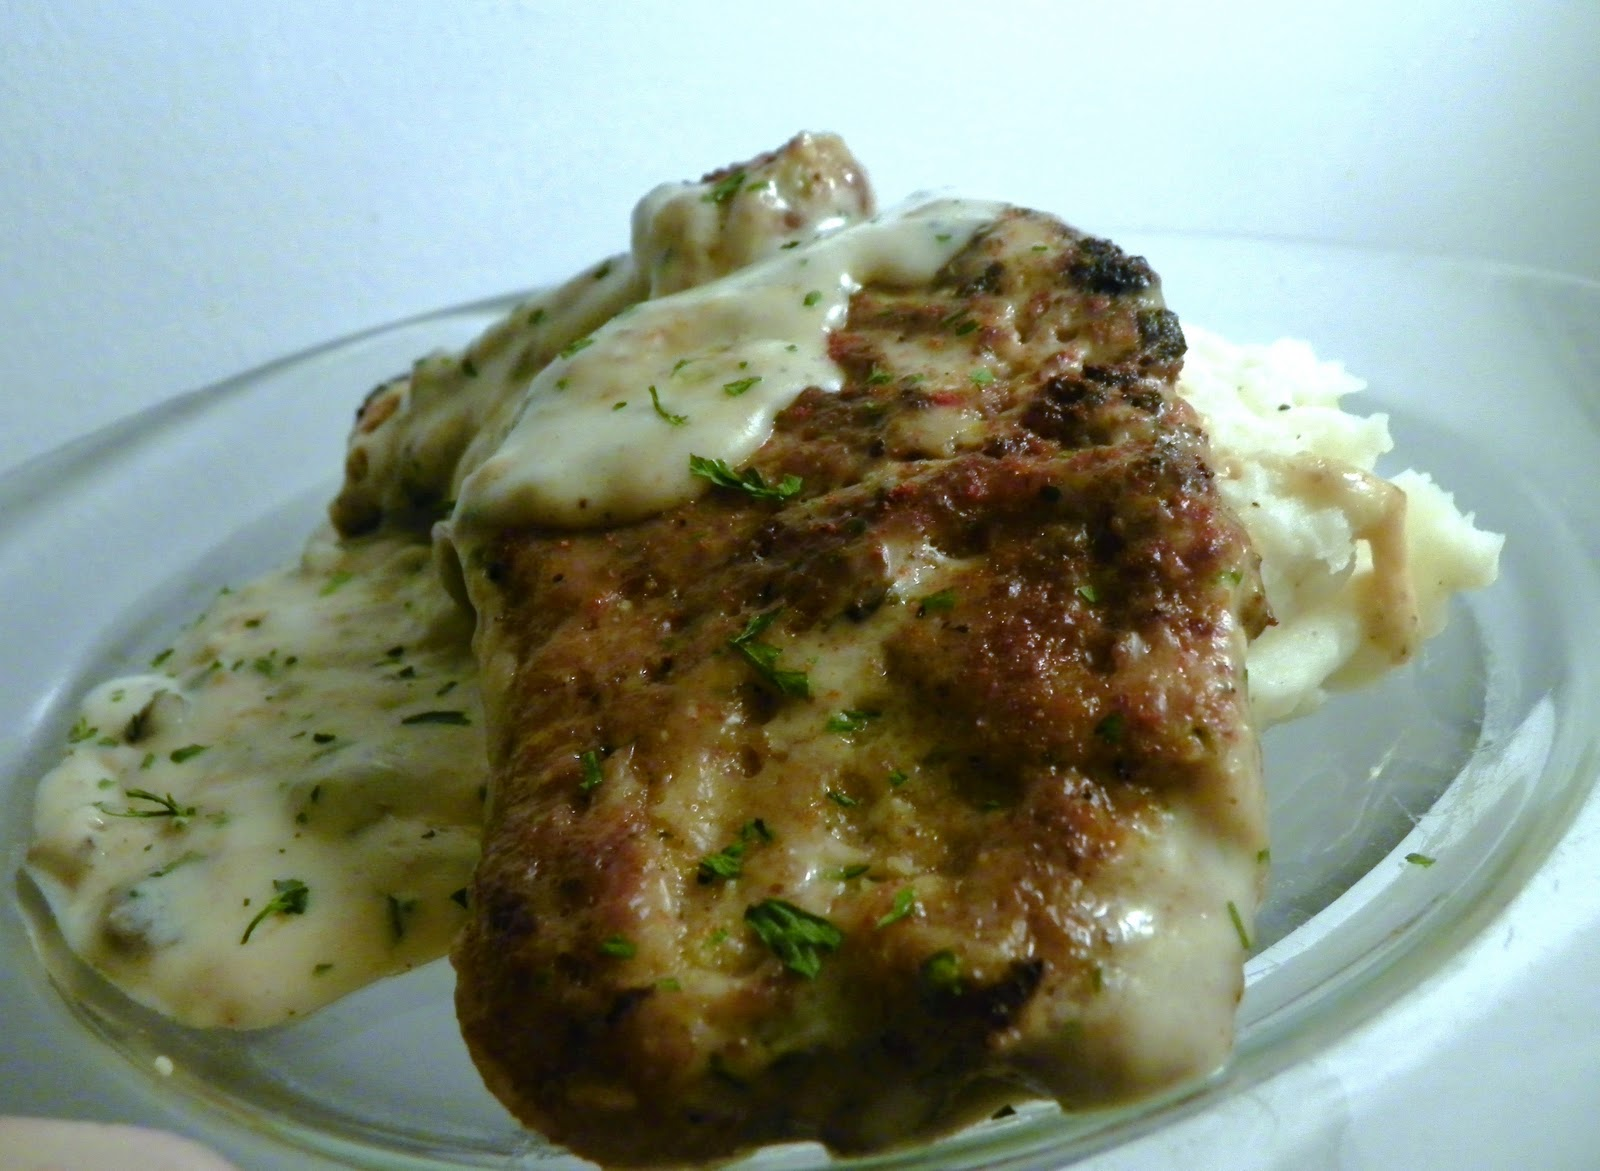 Pork+Chops+in+Creamy+Mushroom+Sauce.JPG